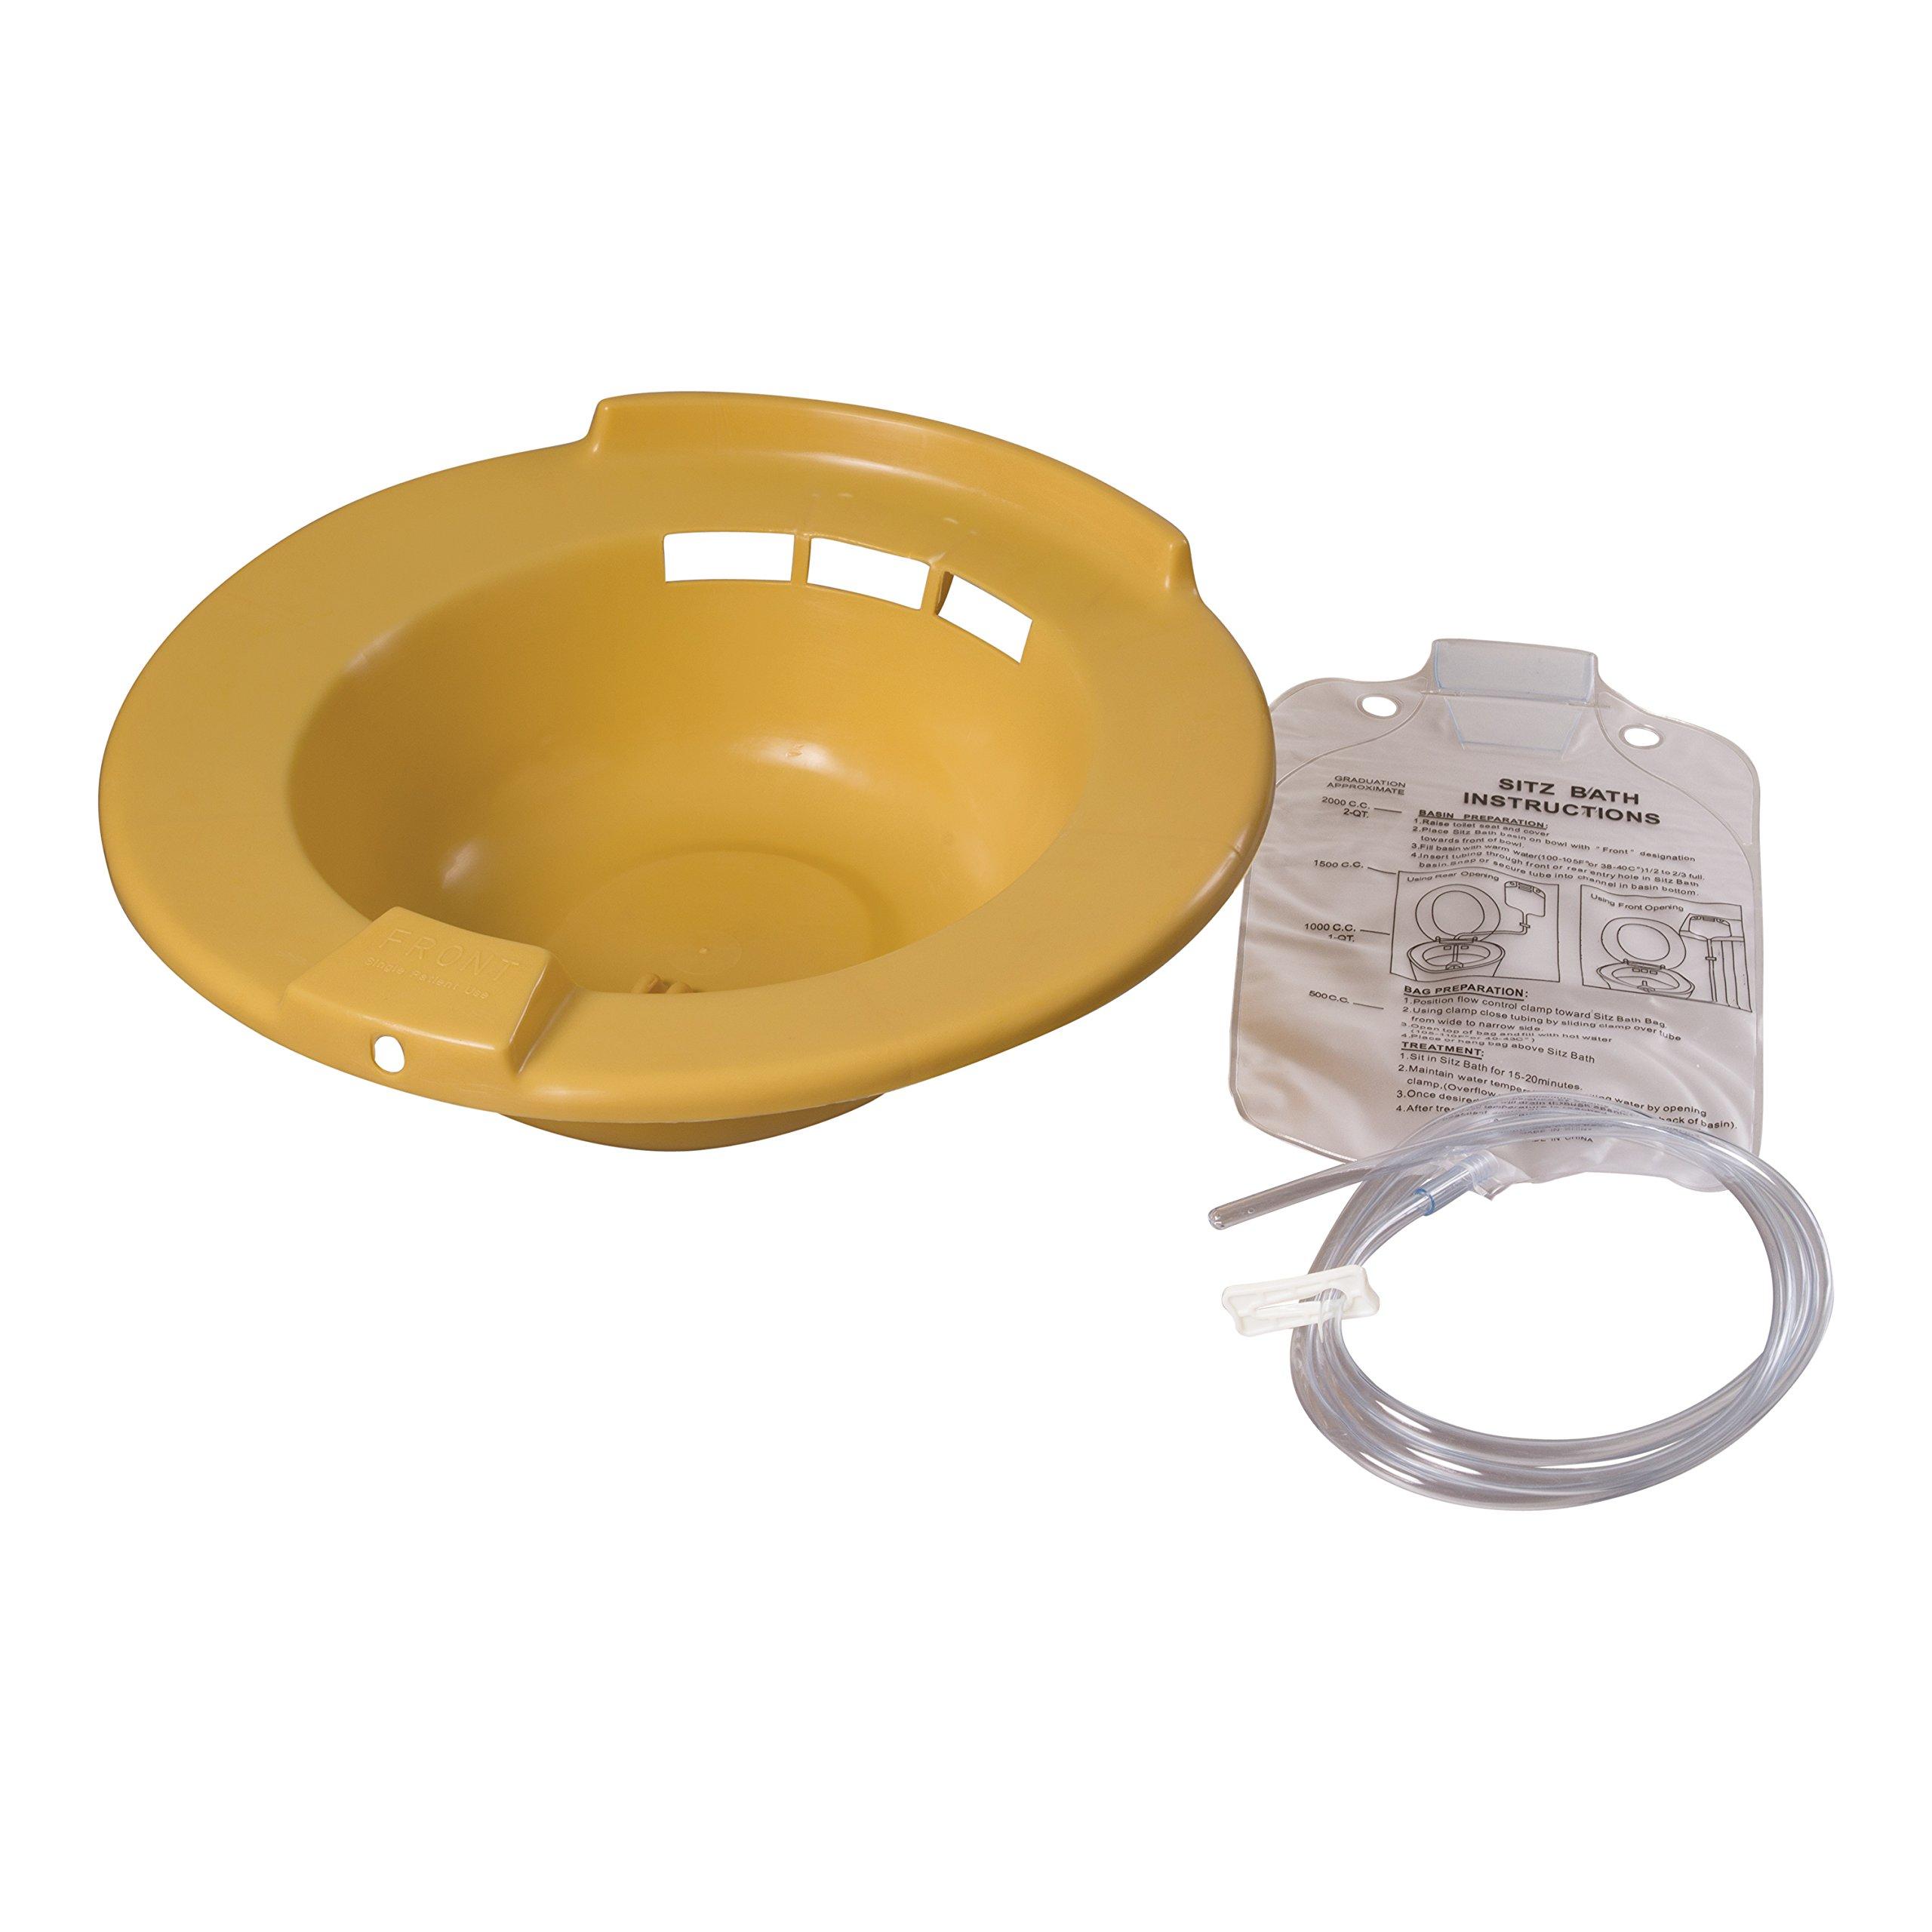 DMI Portable Bidet Sitz Bath, Fits on Toilet, Smooth Contoured Plastic, Yellow by Duro-Med